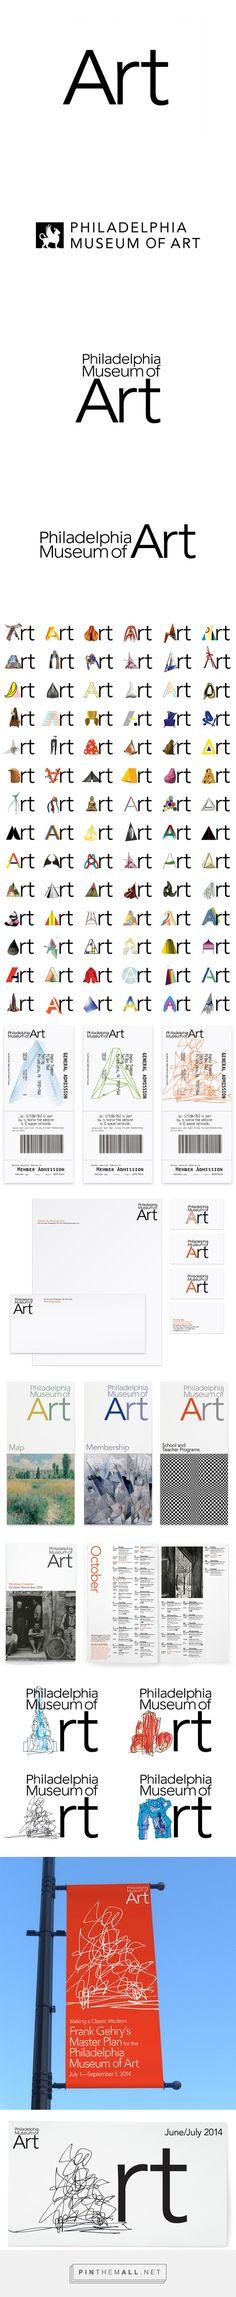 philadelphia museum of art rebrand by paula scher - created via http://pinthemall.net